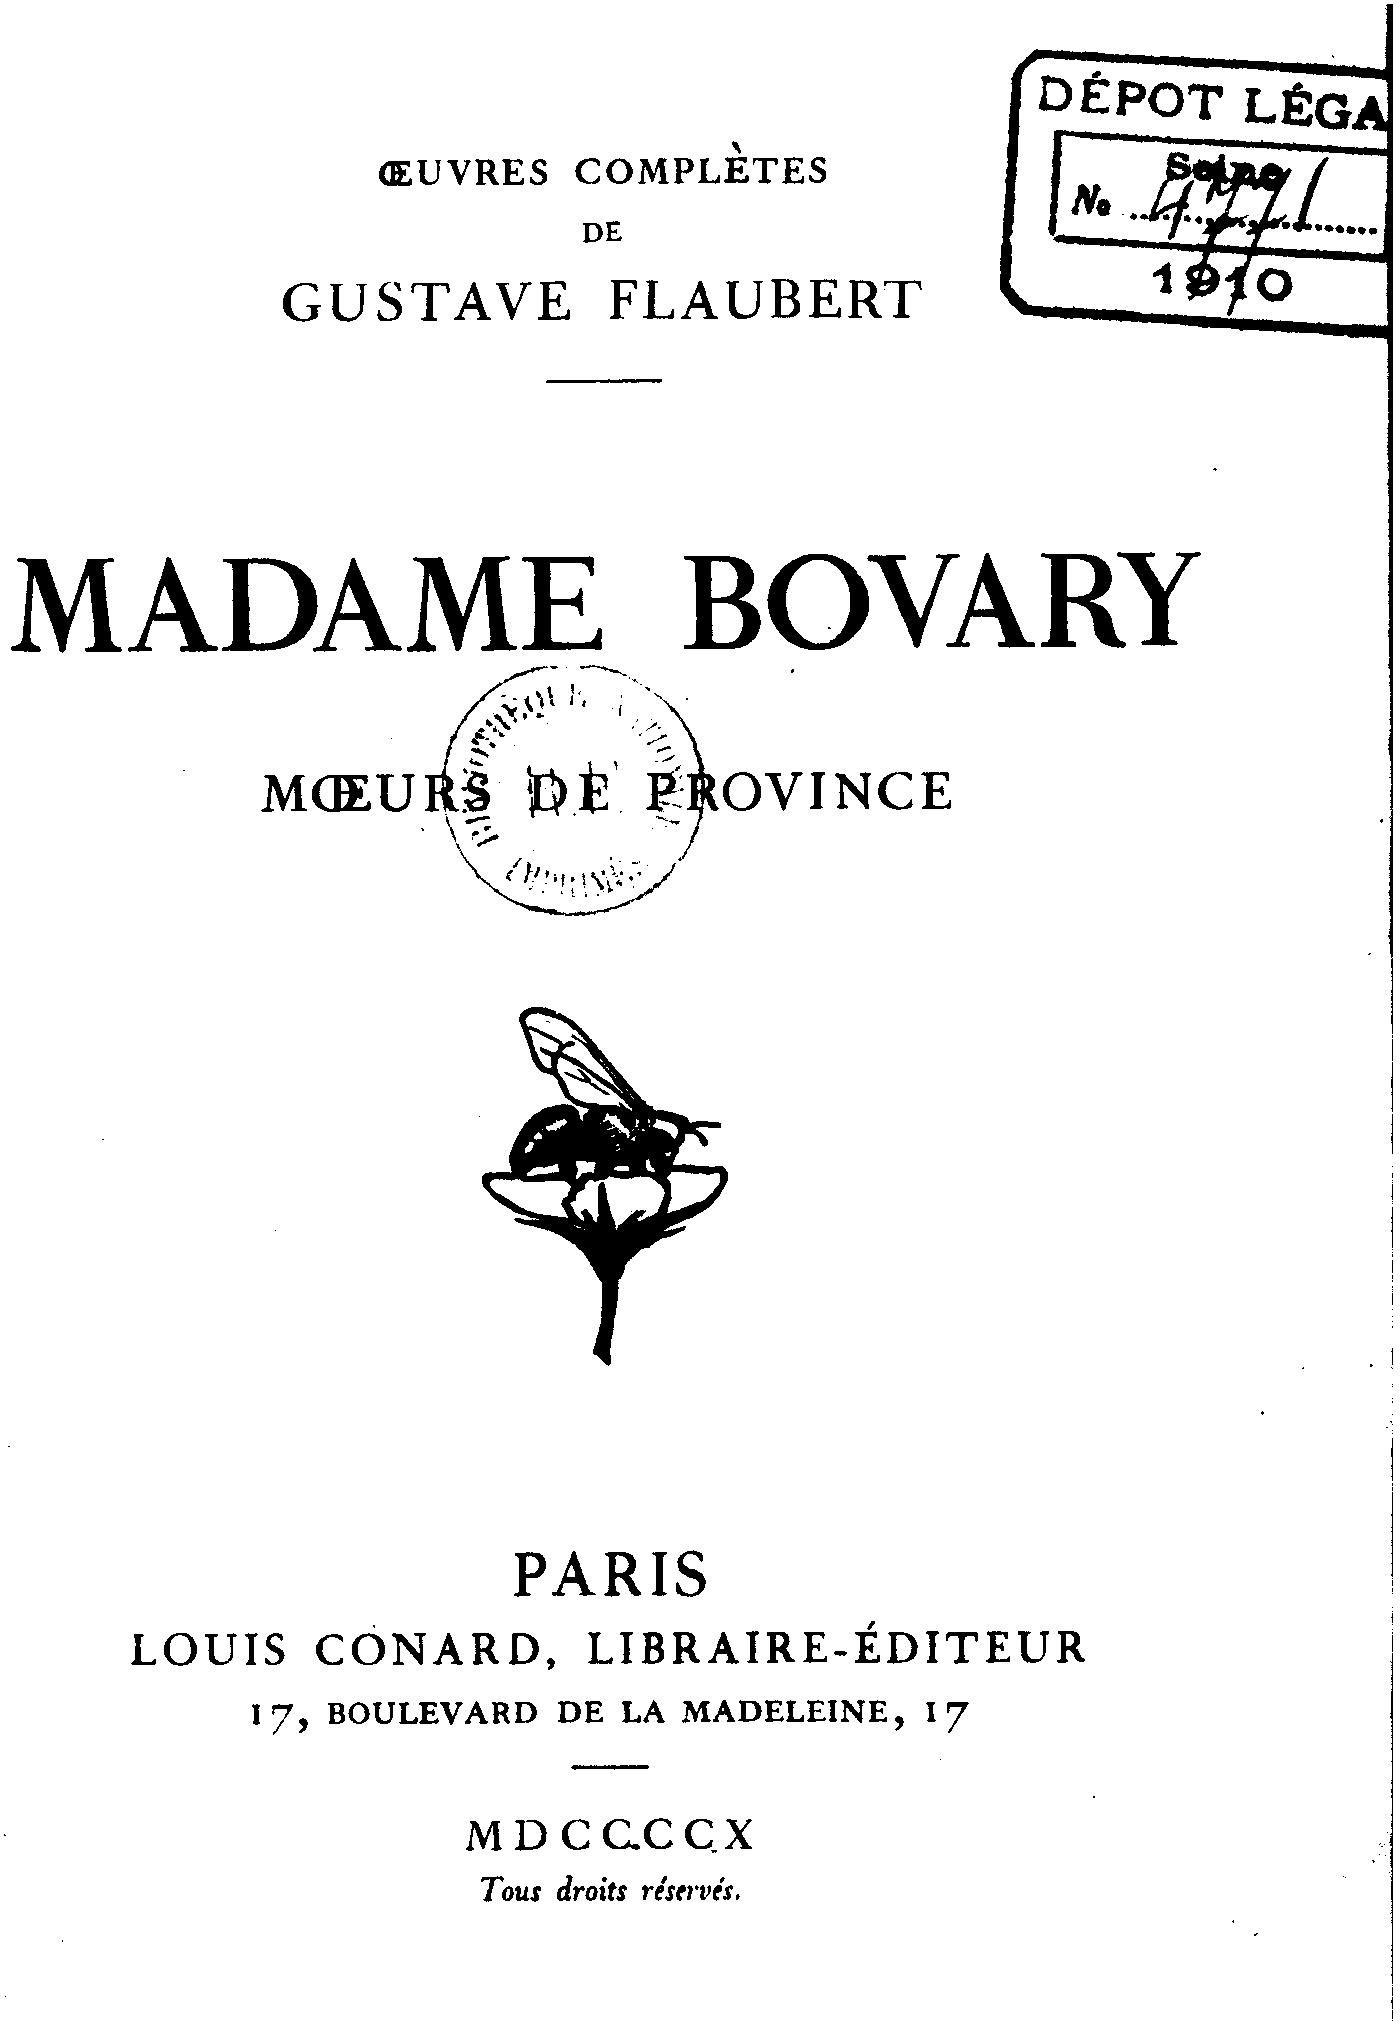 https://upload.wikimedia.org/wikipedia/commons/b/bf/Madamebovary-vi.jpg